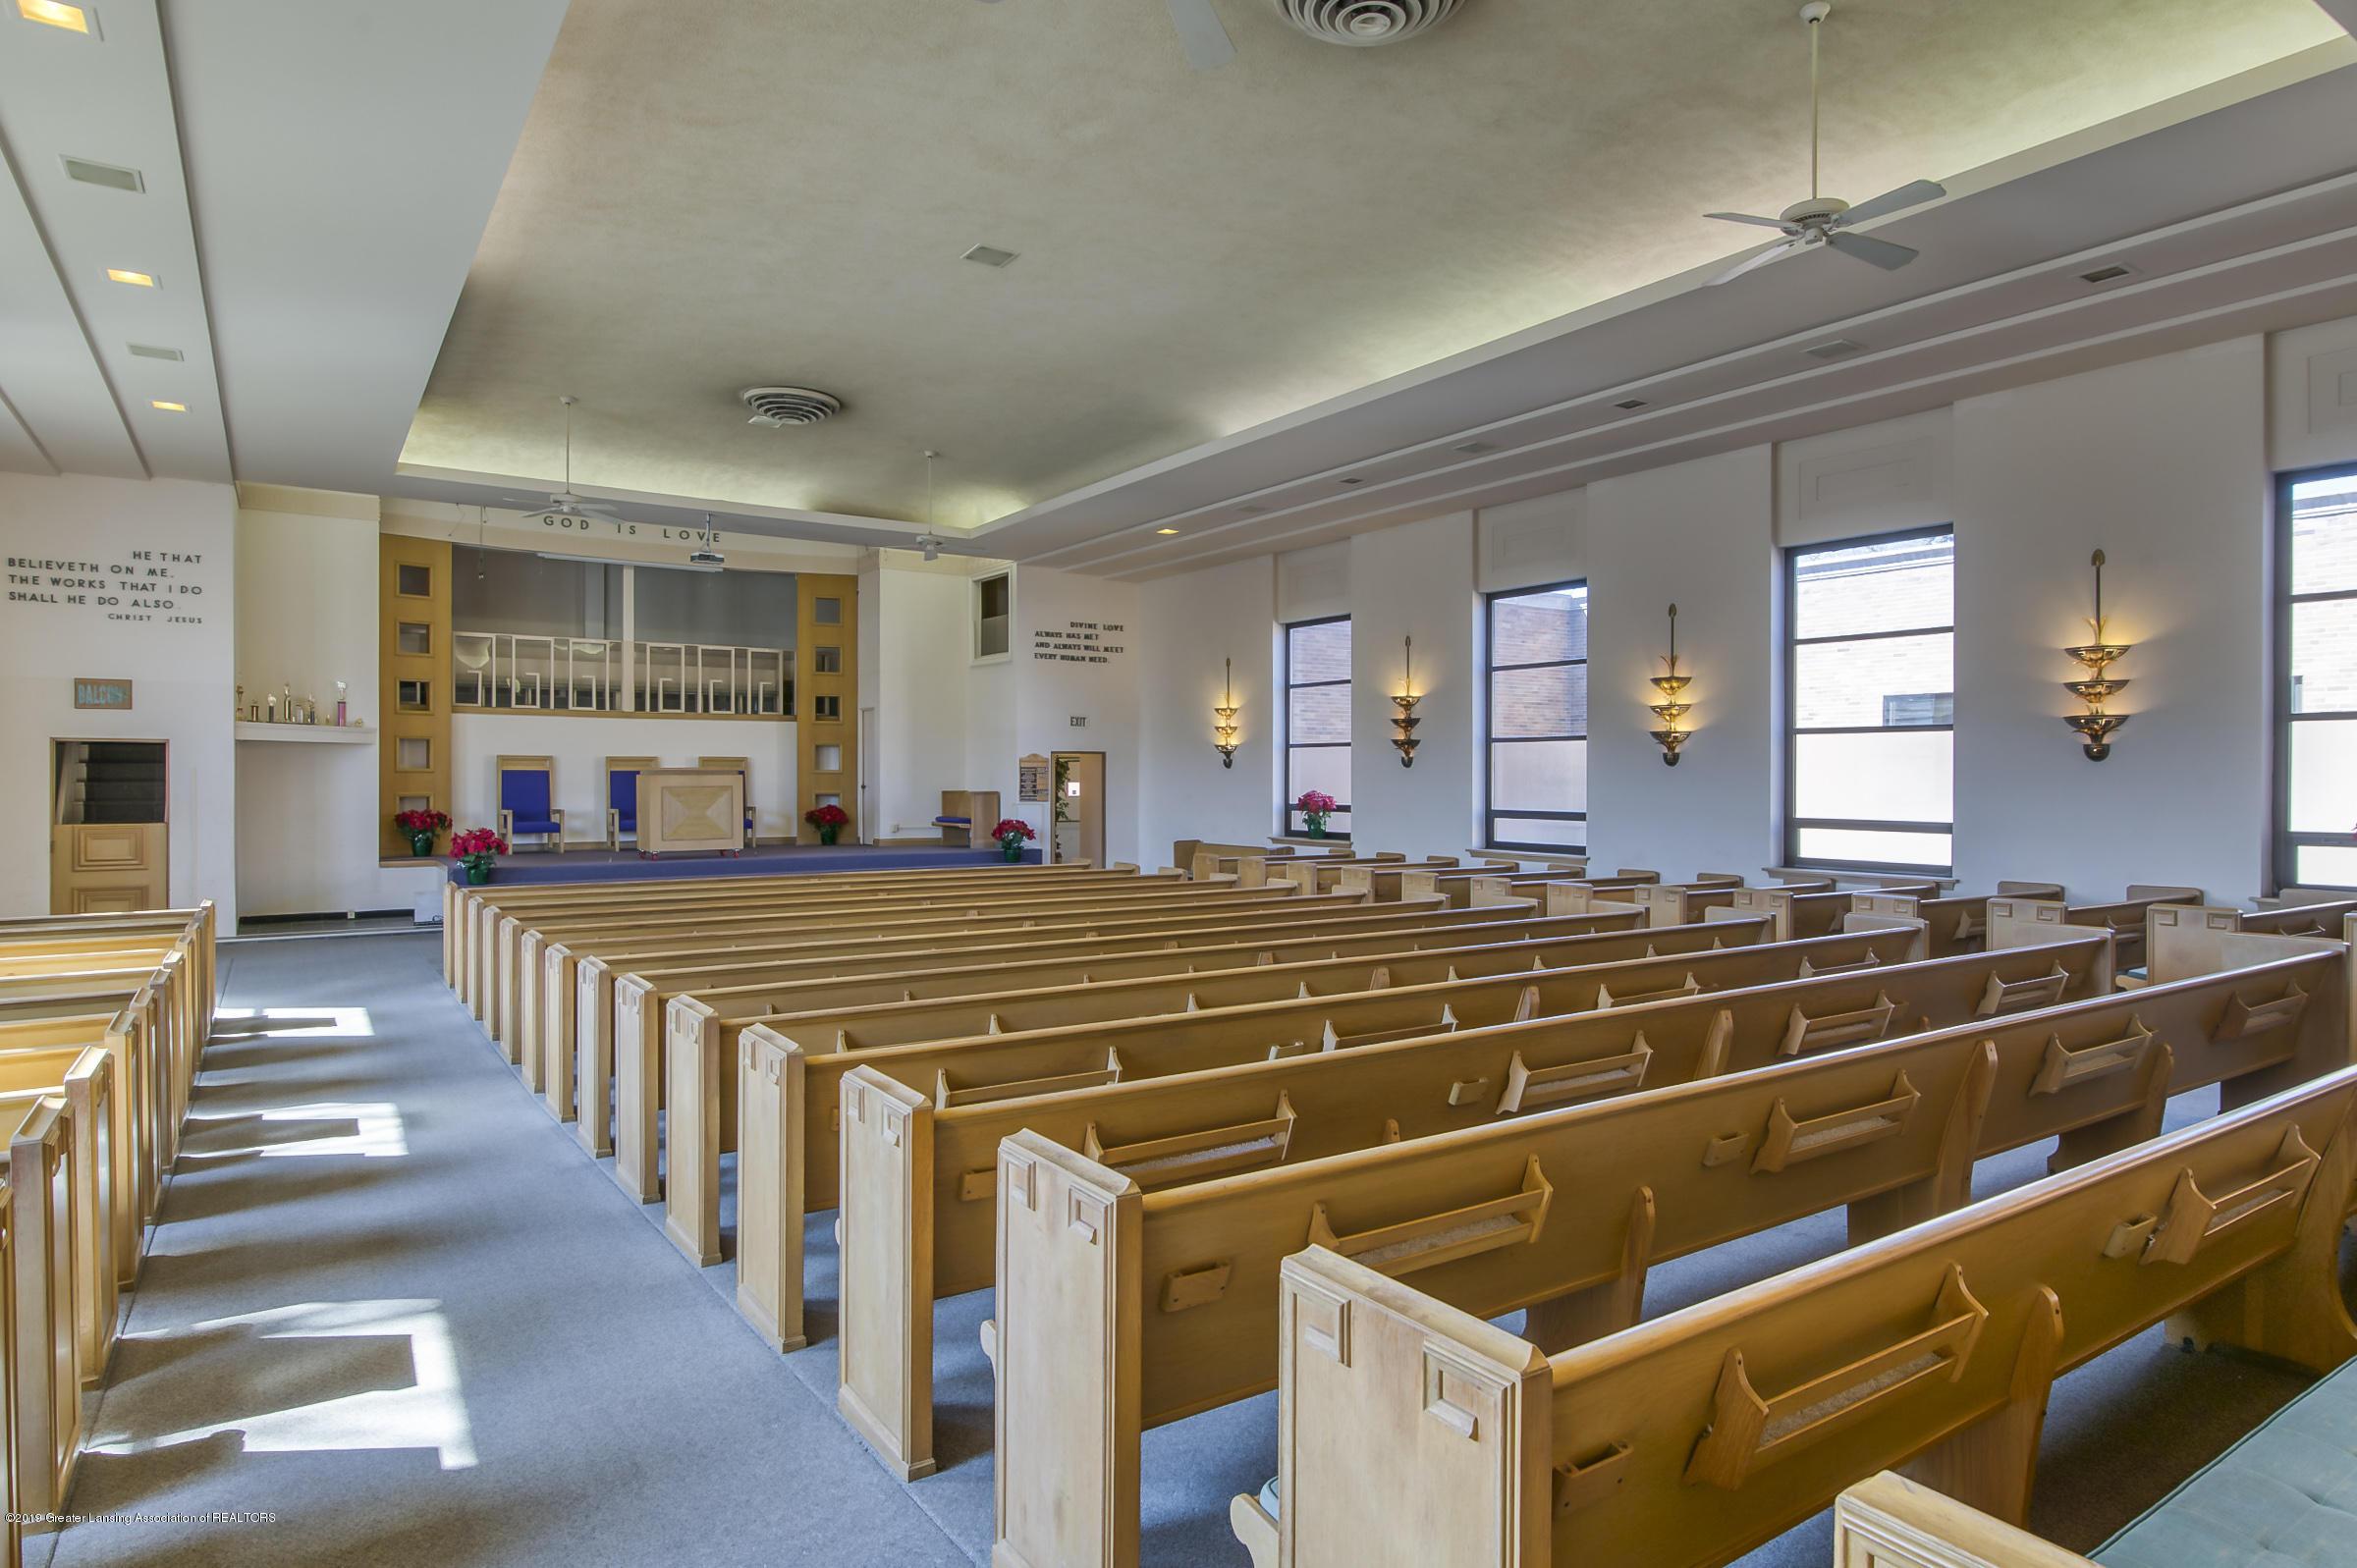 505 Seymour Ave - Sanctuary - 12